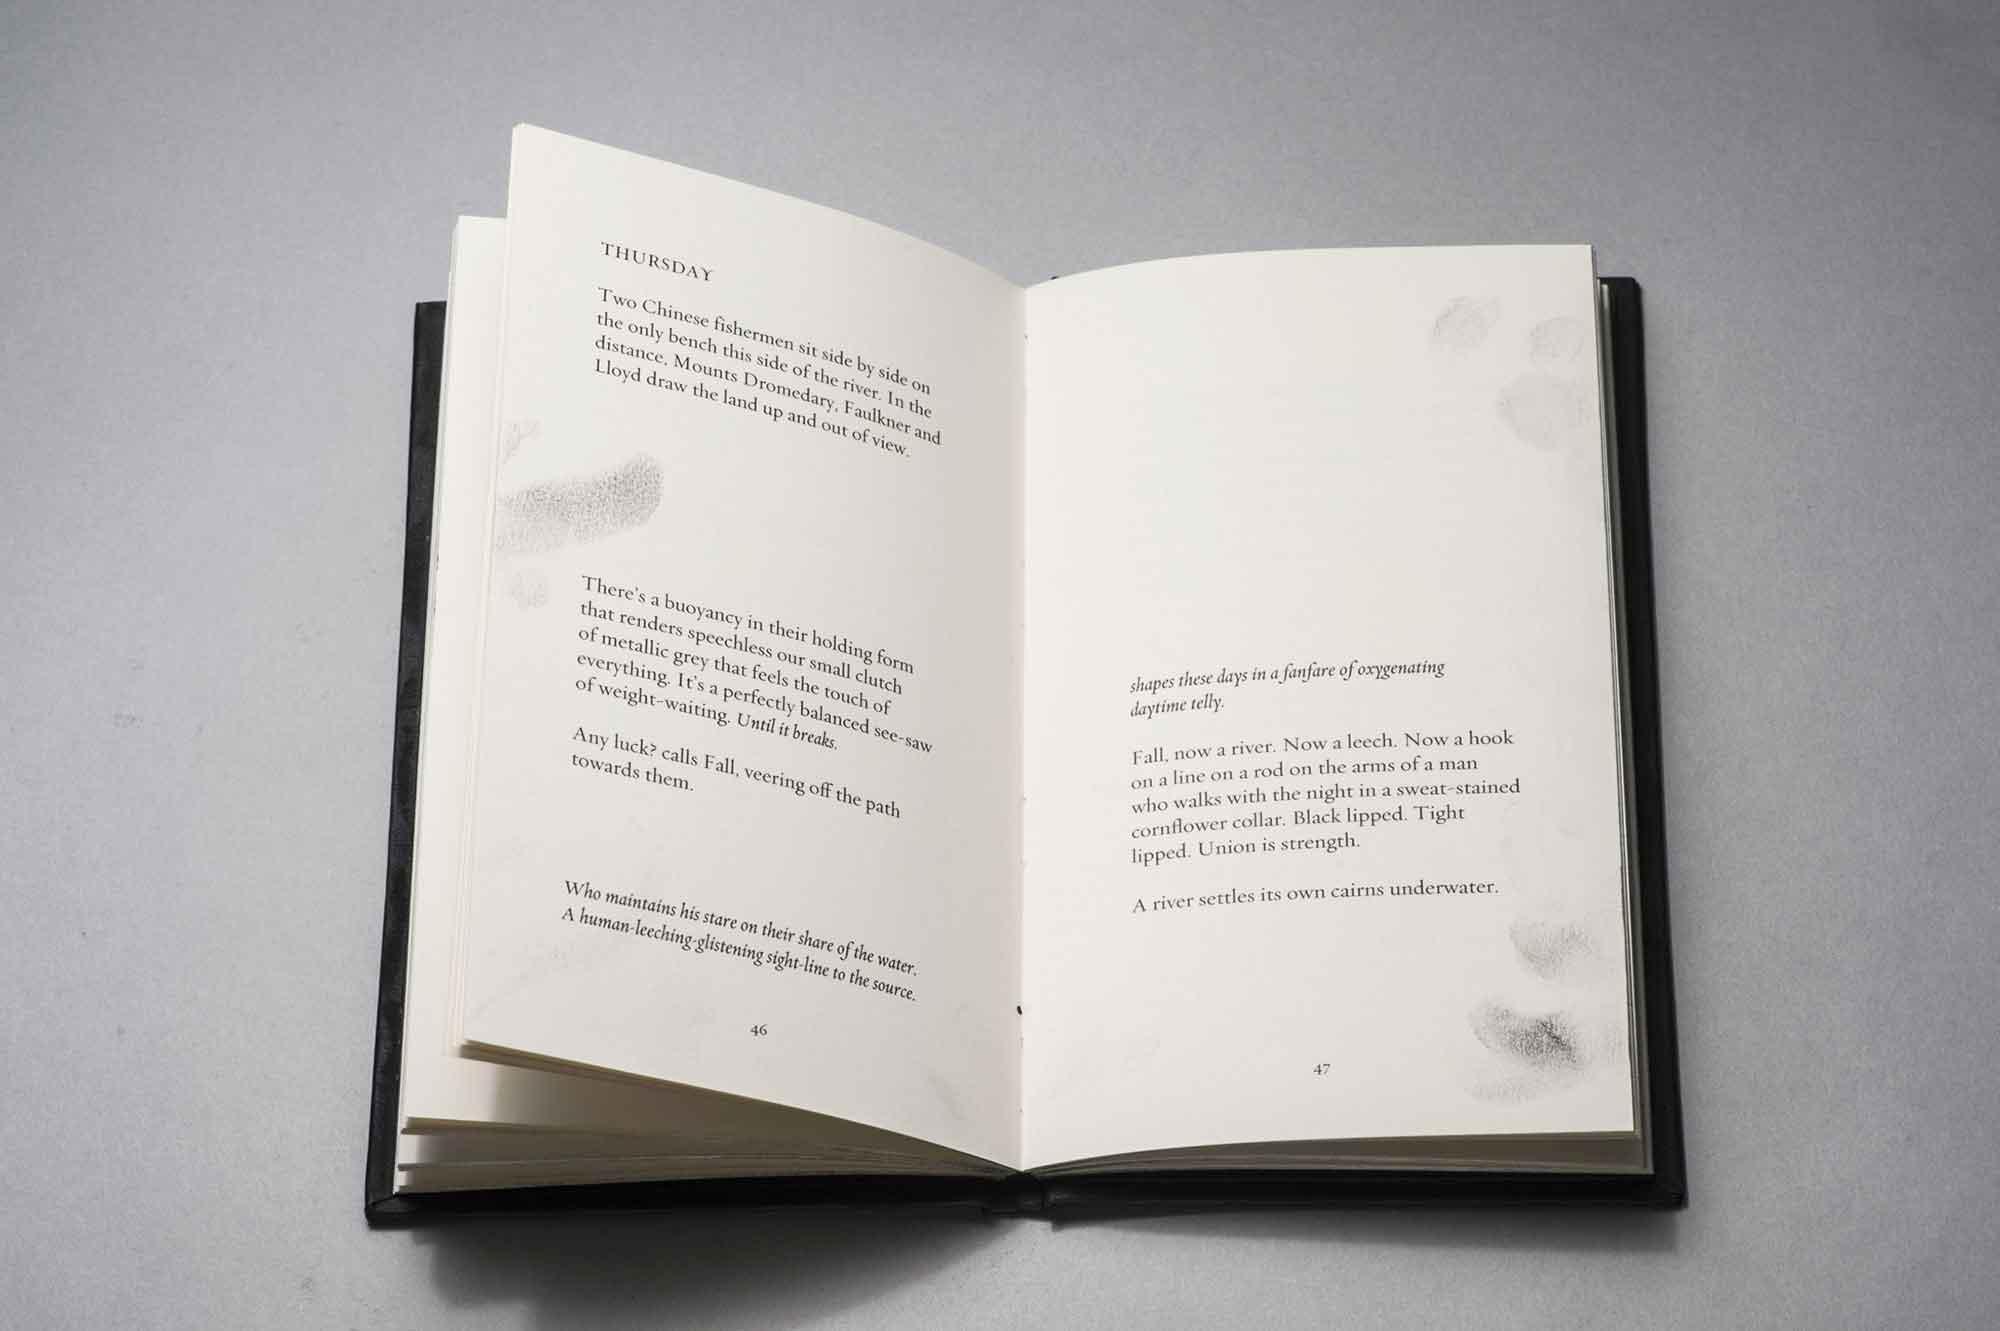 FOTD book, 1